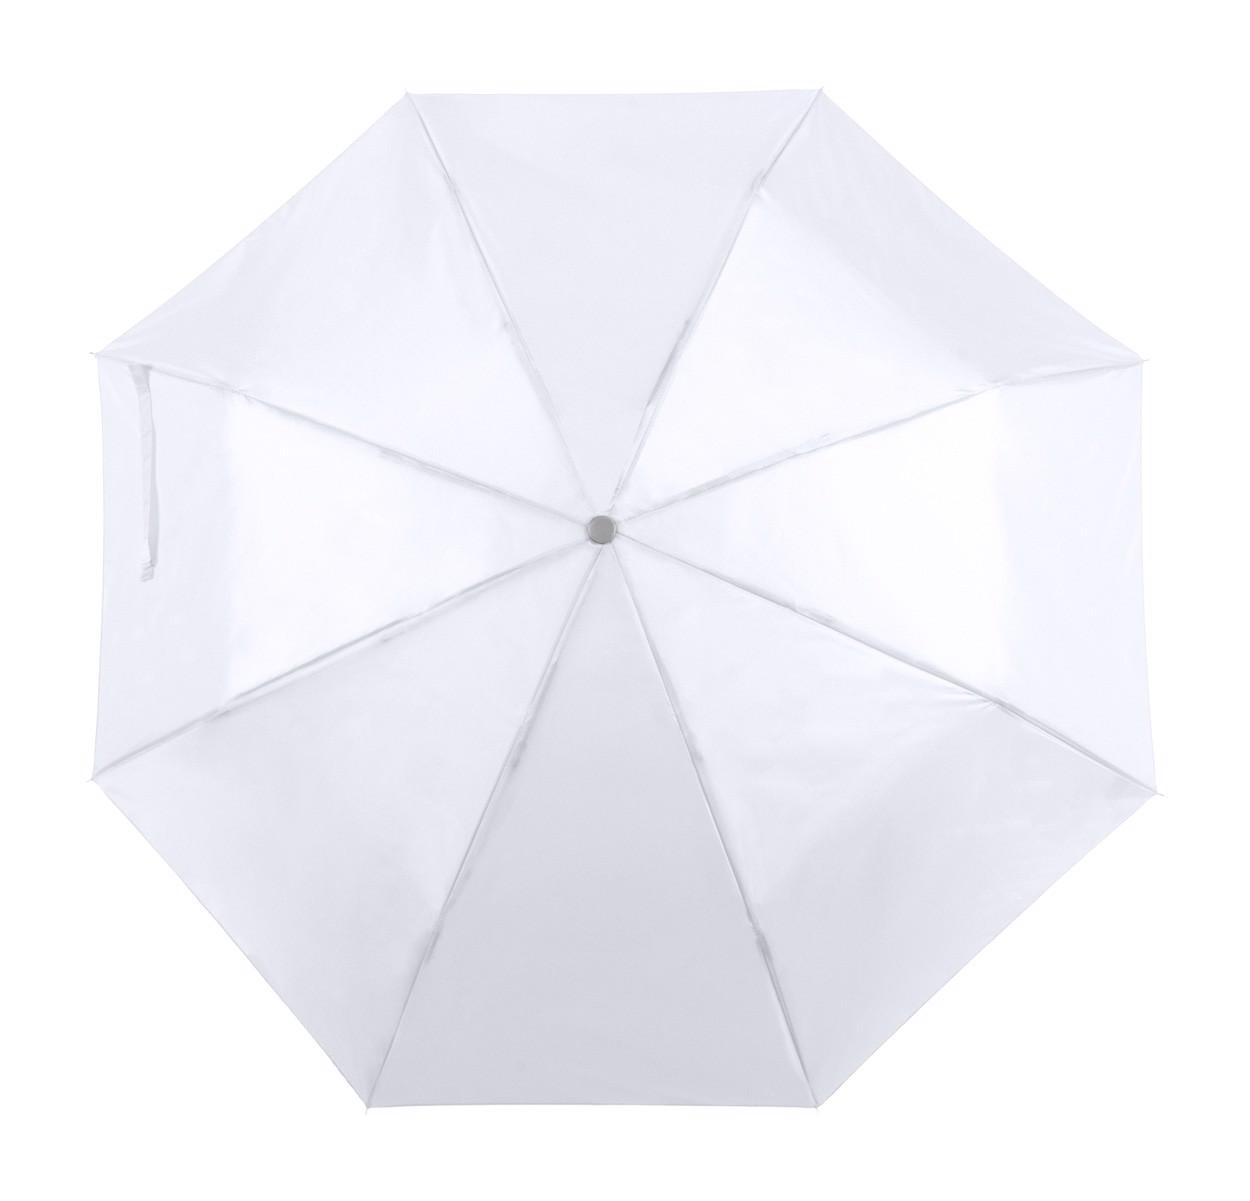 Umbrella Ziant - White